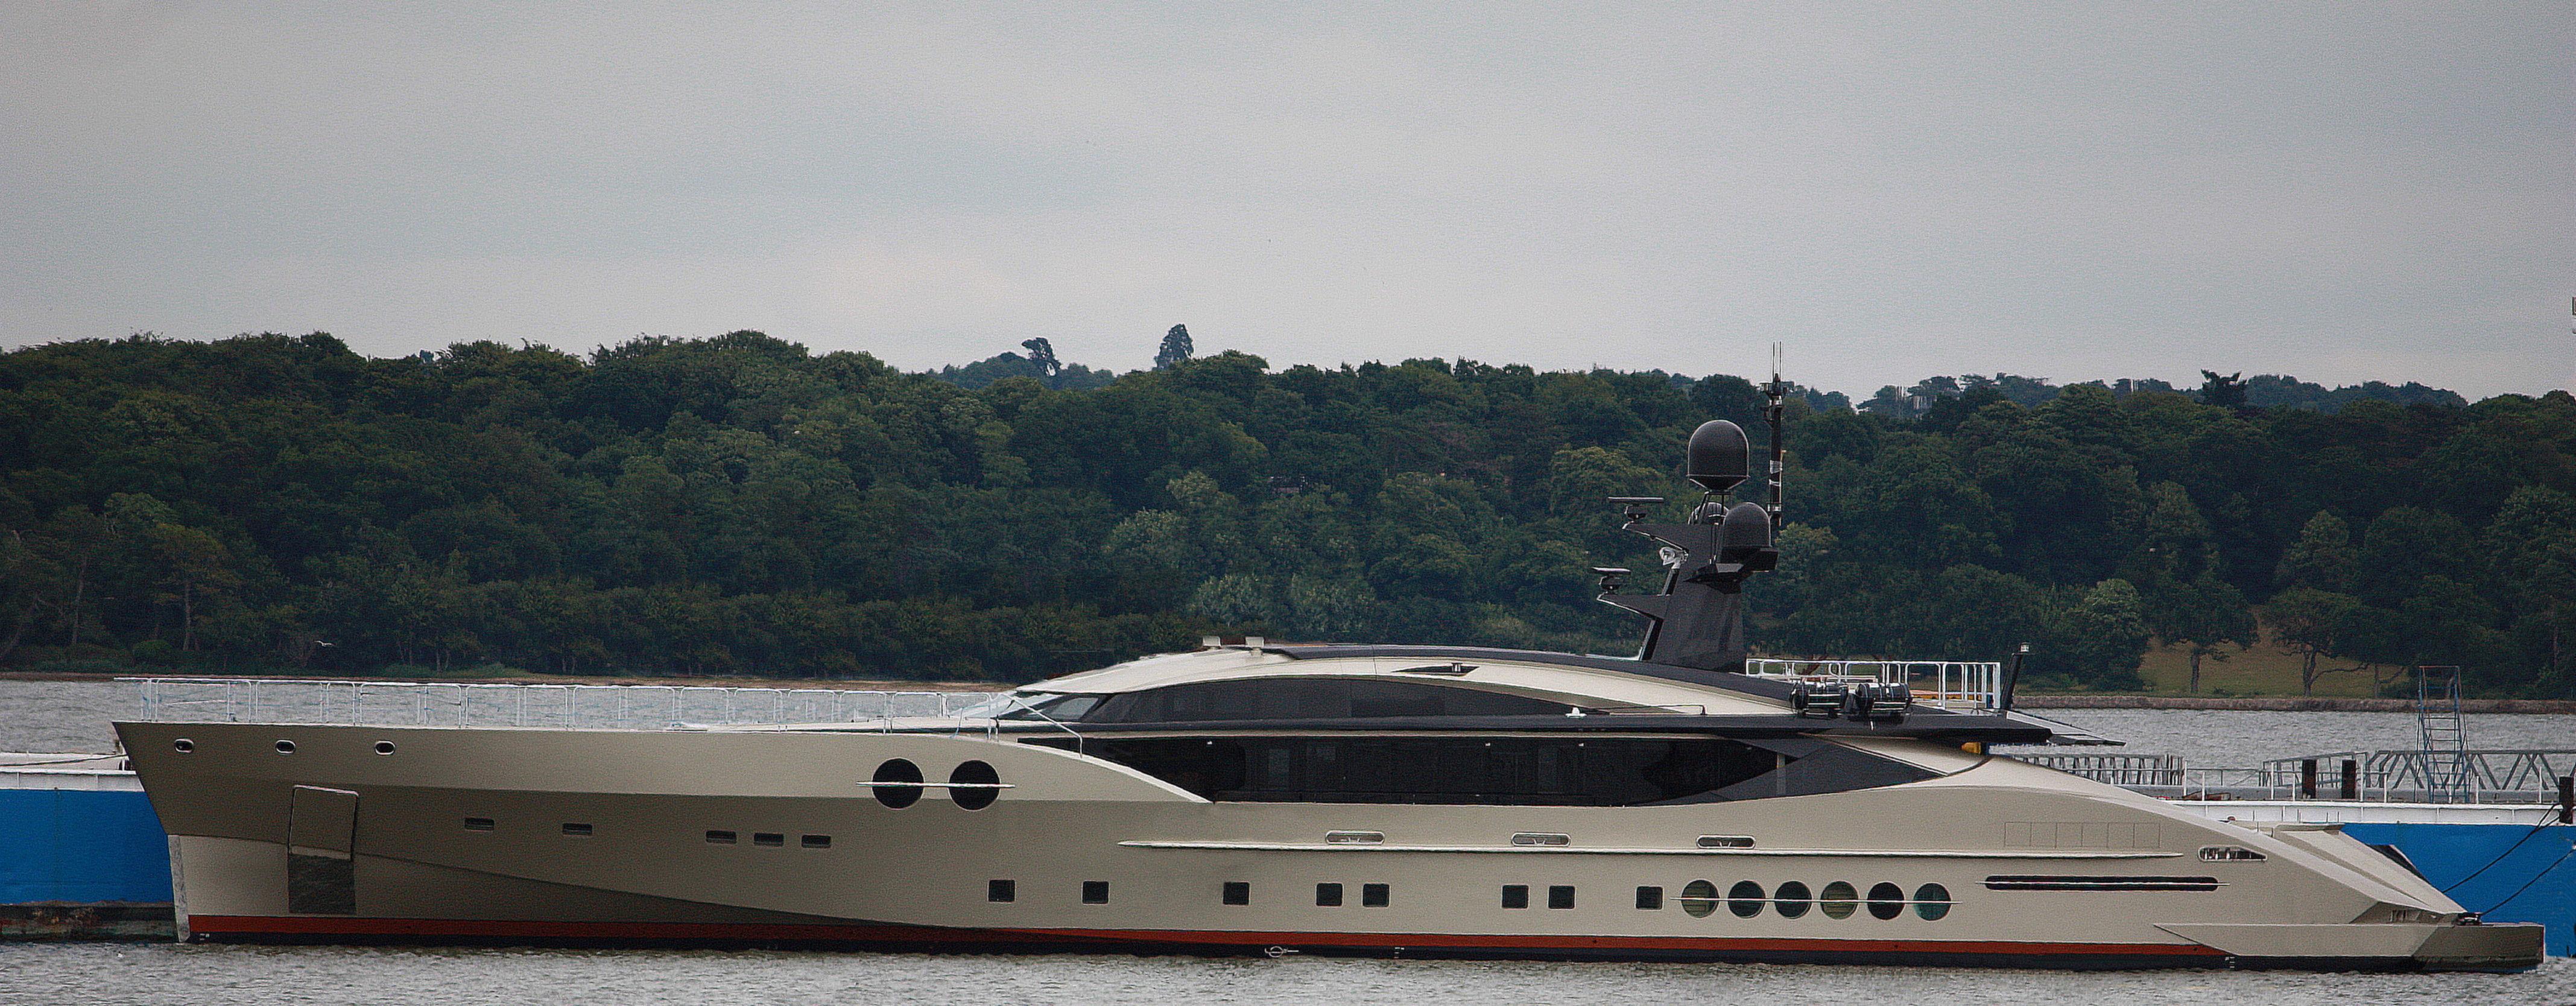 Palmer Johnson Launches Motor Yacht PJ-501 — Yacht Charter